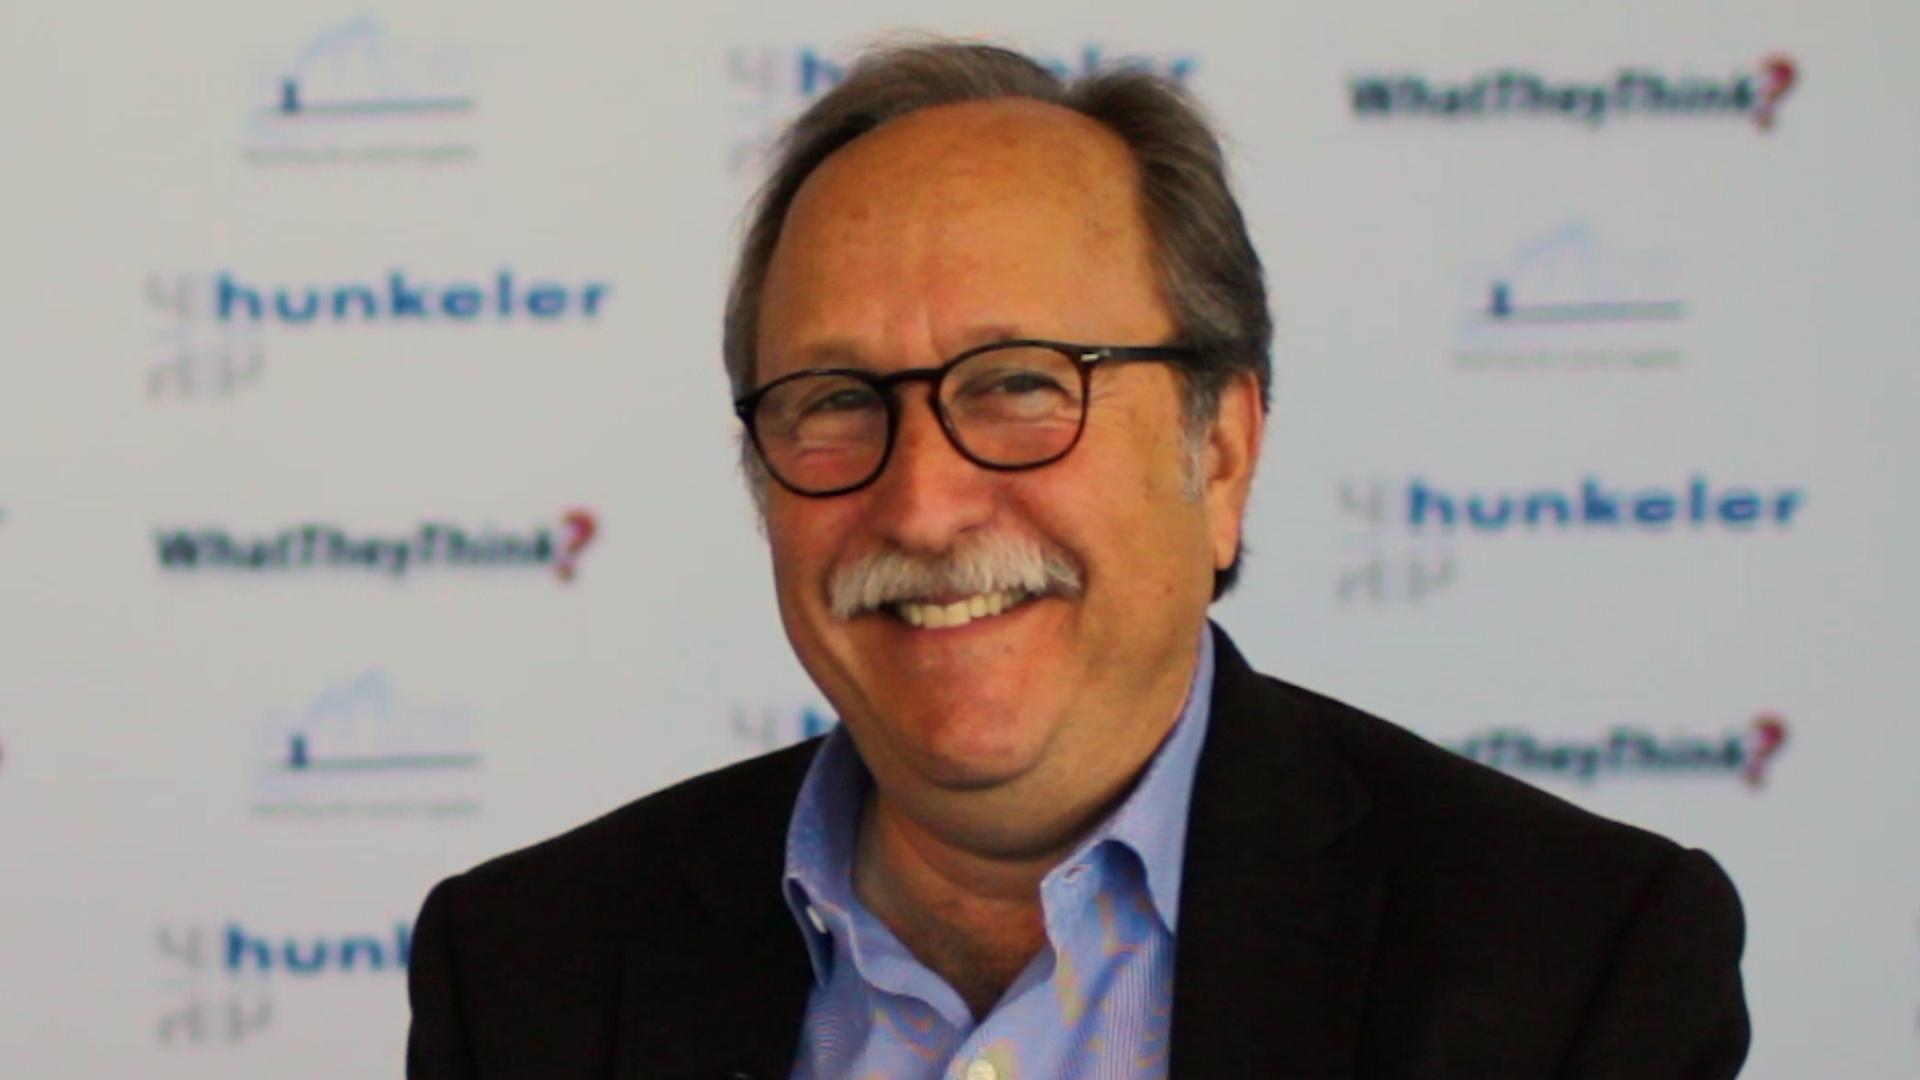 Hunkeler Innovationdays: Off to a Great Start